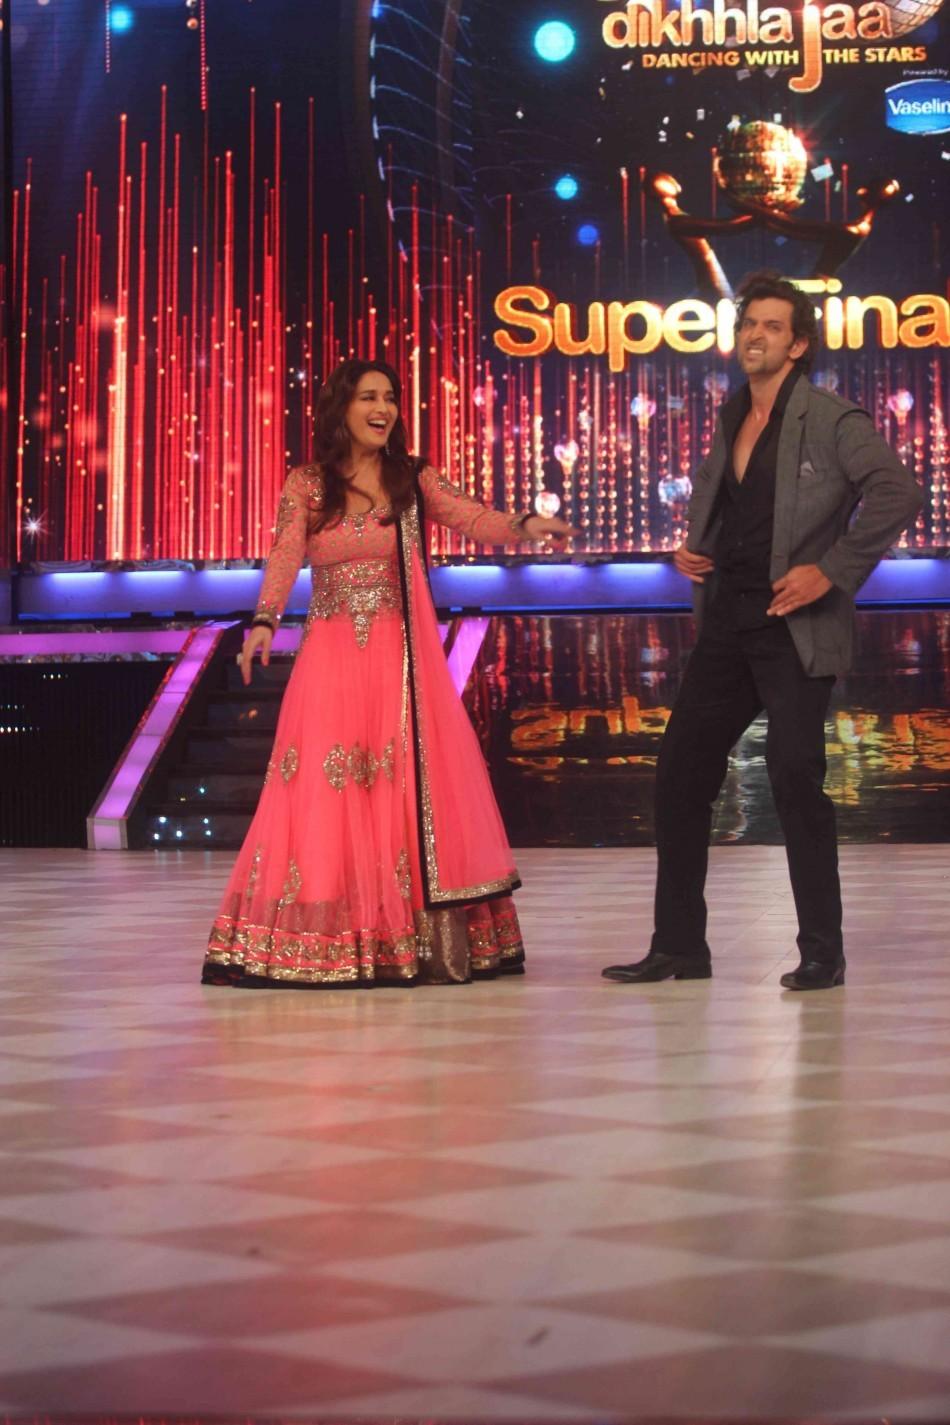 Madhuri and Hrithik matches steps on the dance floor (photo Varinder Chawla)